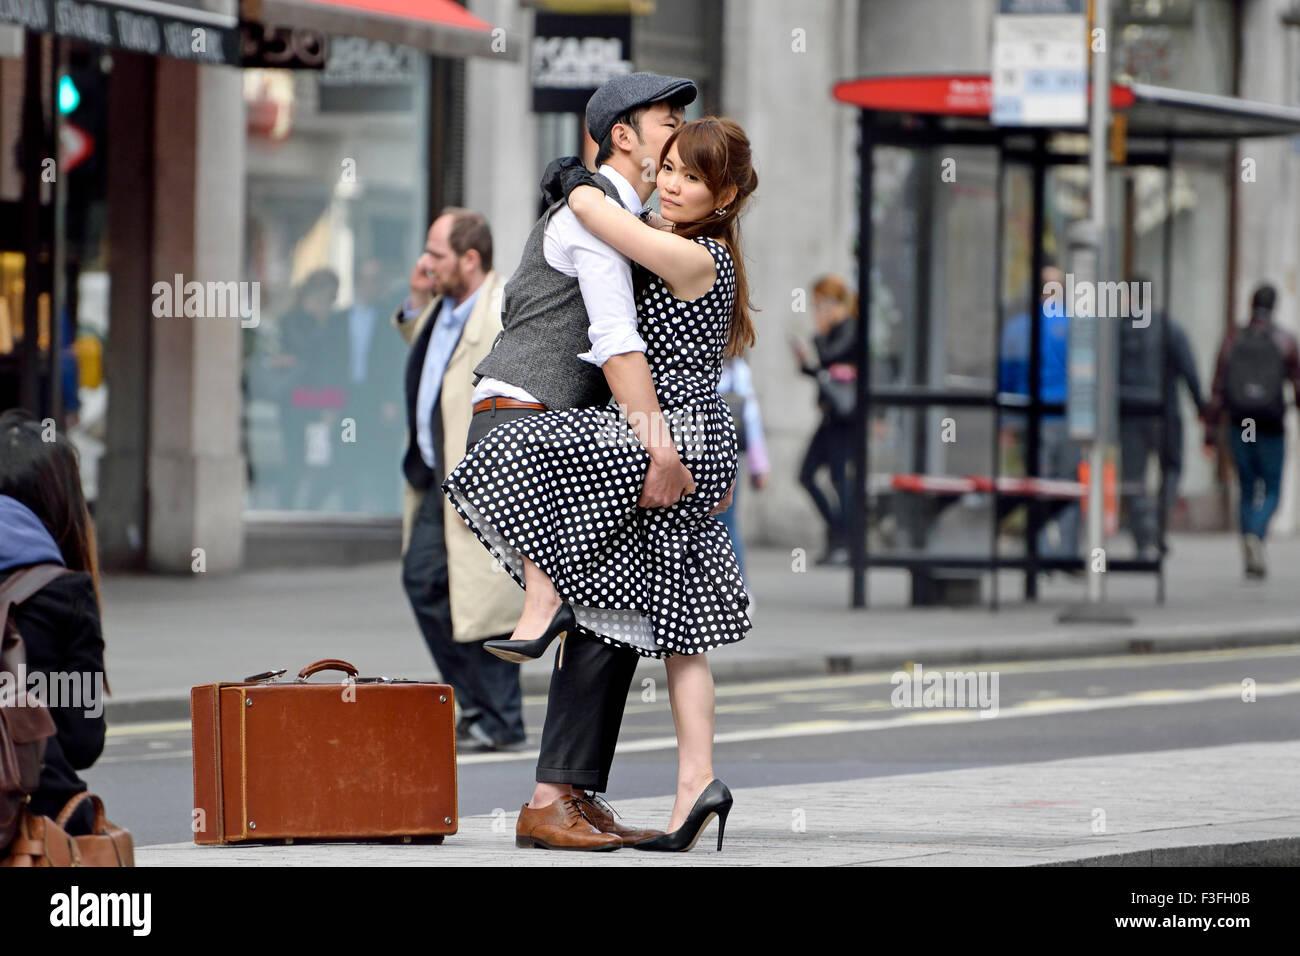 London, England, UK. Japanese couple (models) posing for a photographer in Regent Street - Stock Image